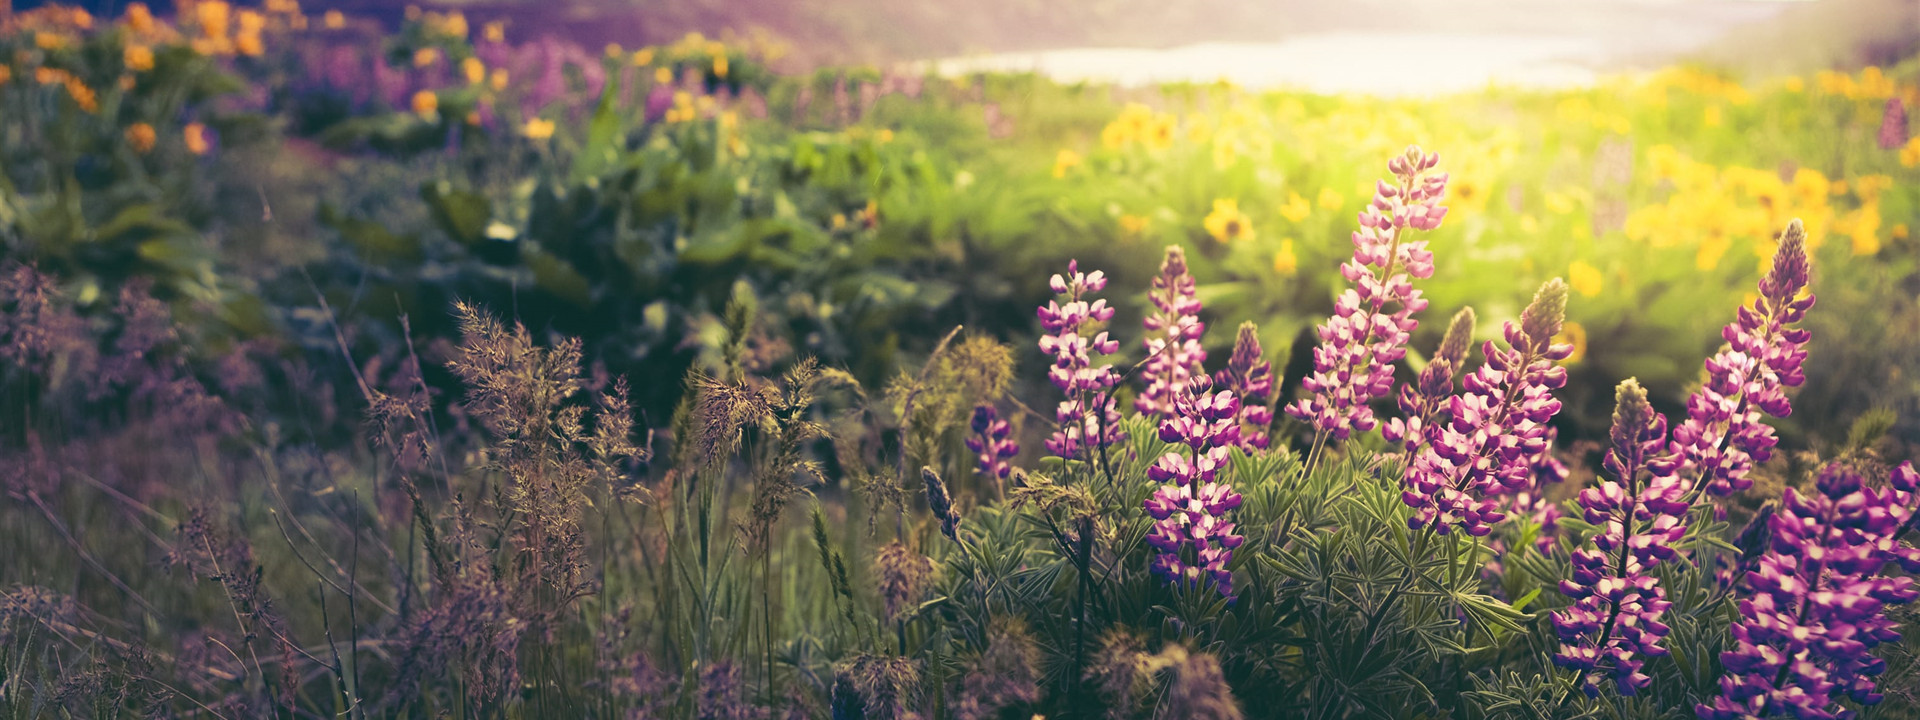 Grief & Healing | Farnstrom Mortuary